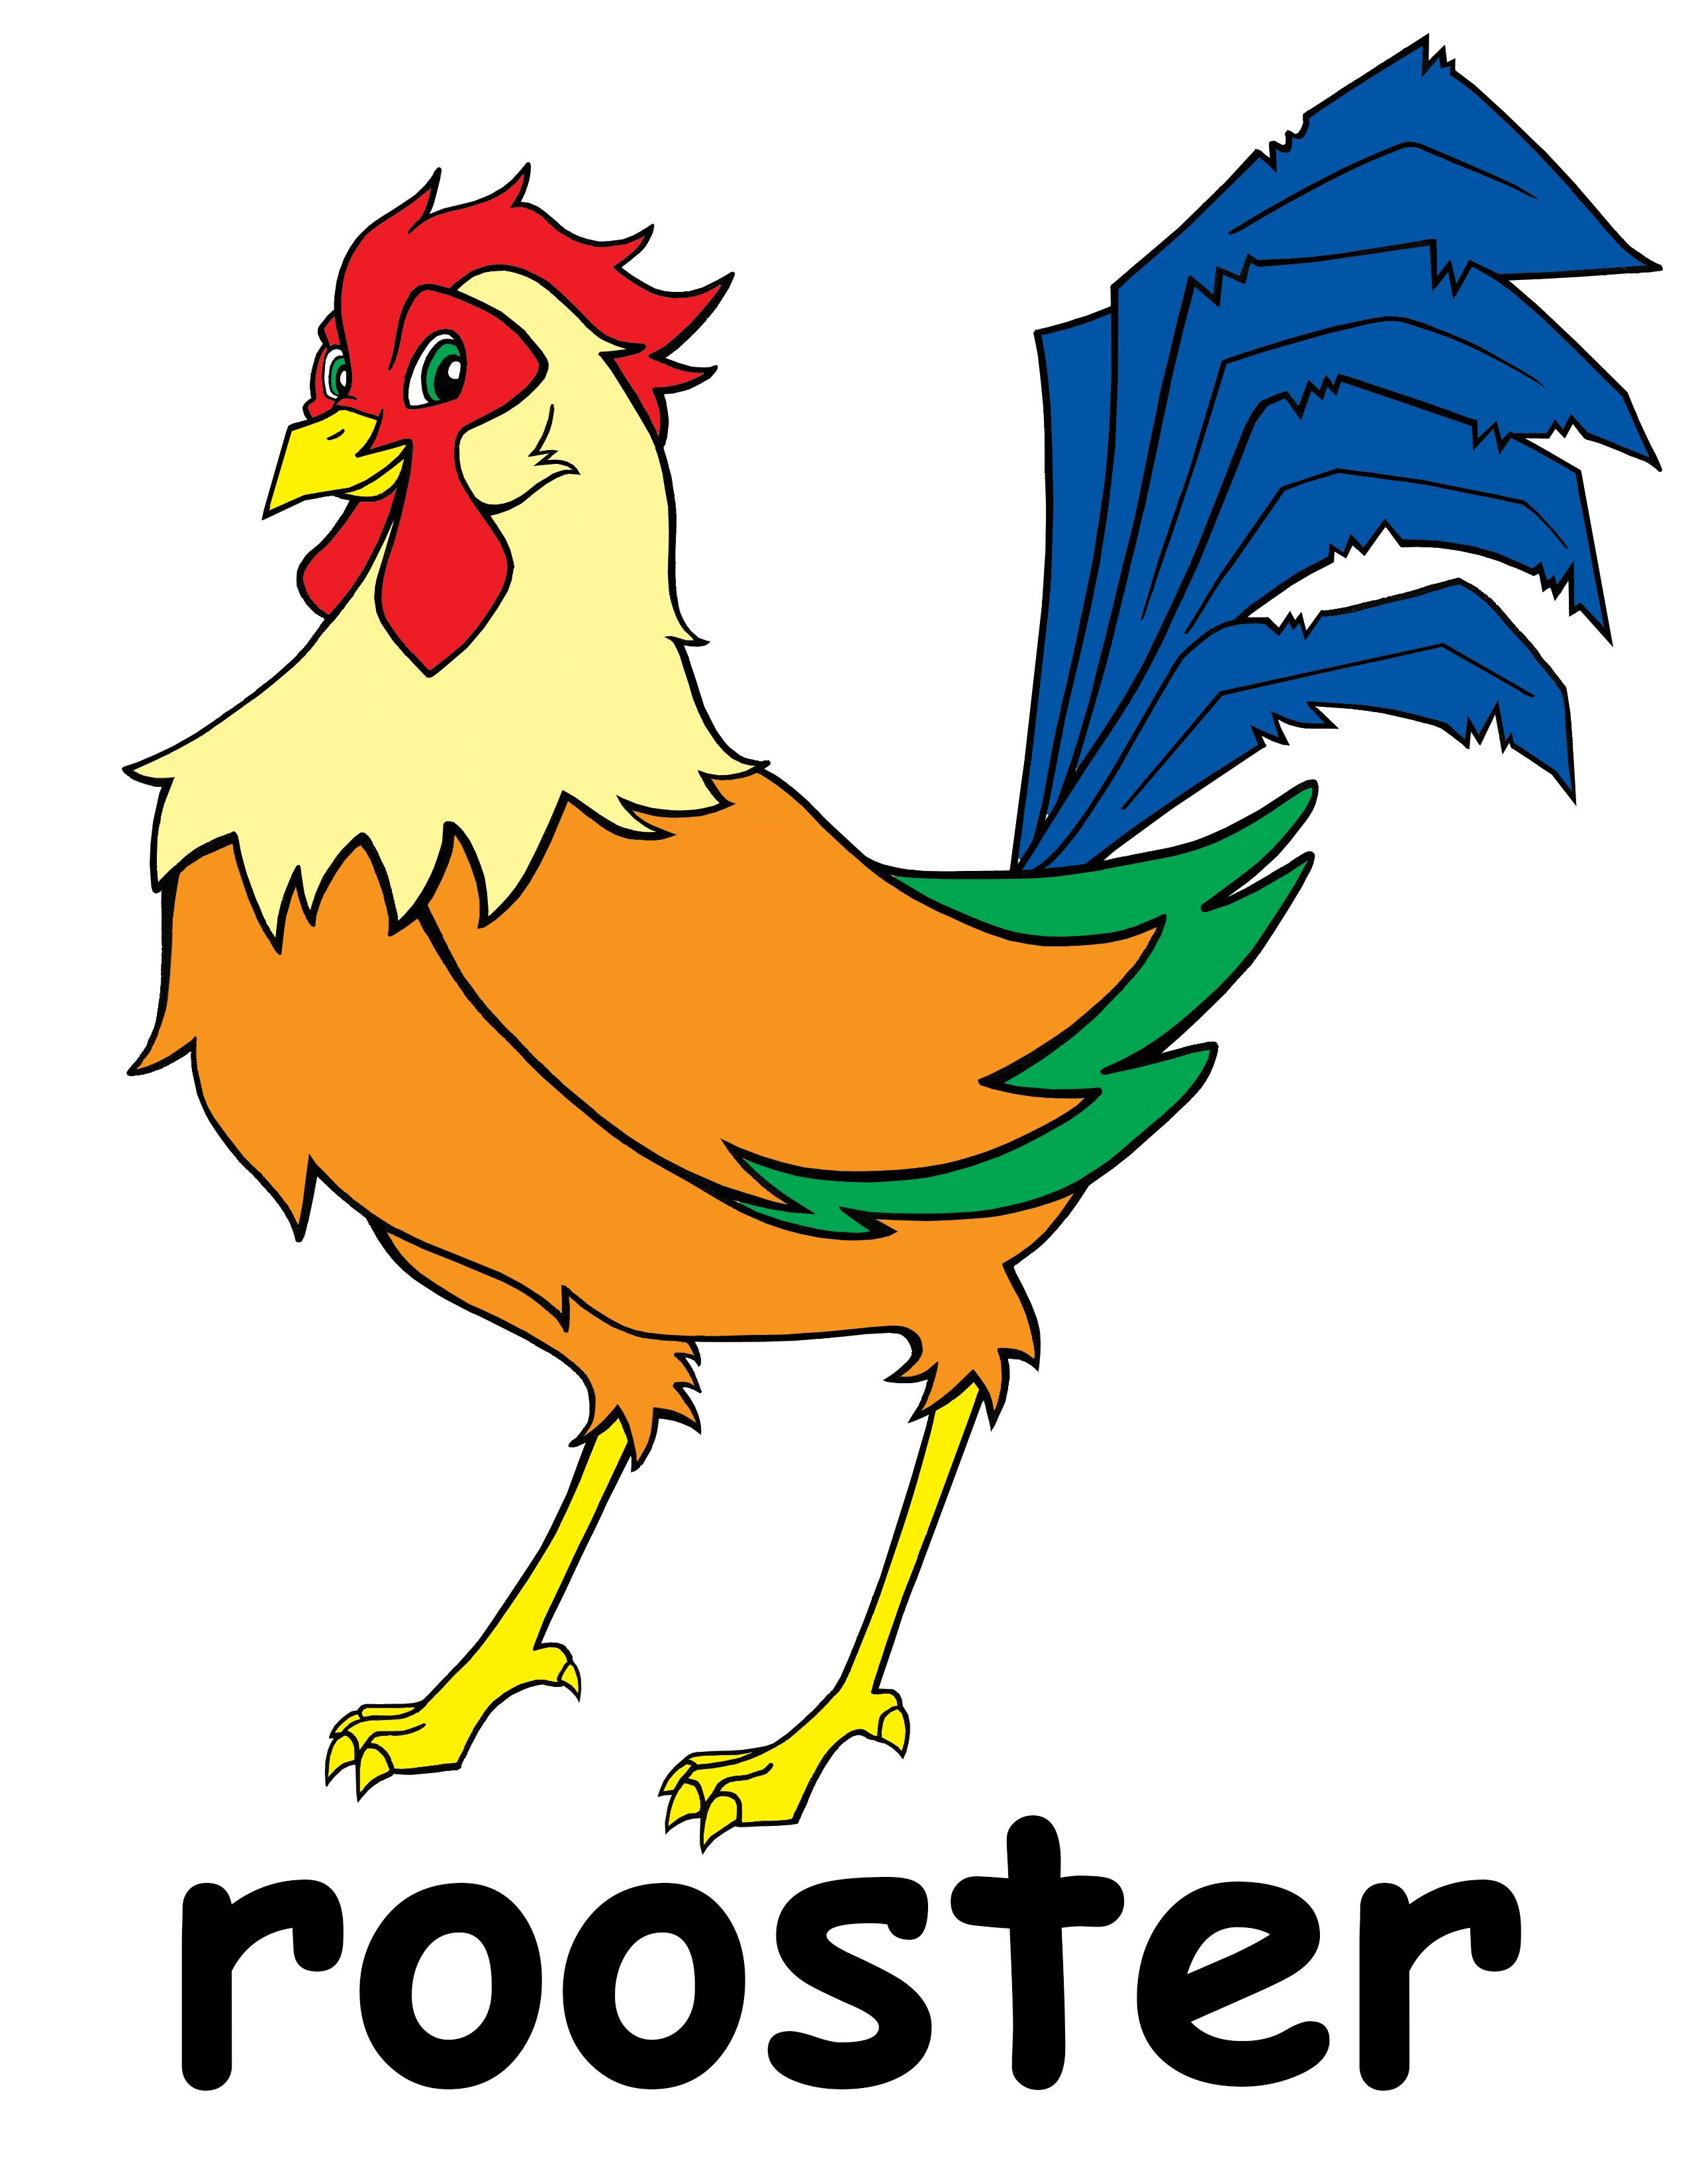 rooster clip art cartoon free clipart panda free clipart images rh clipartpanda com clipart rooster silhouette rooster clipart images